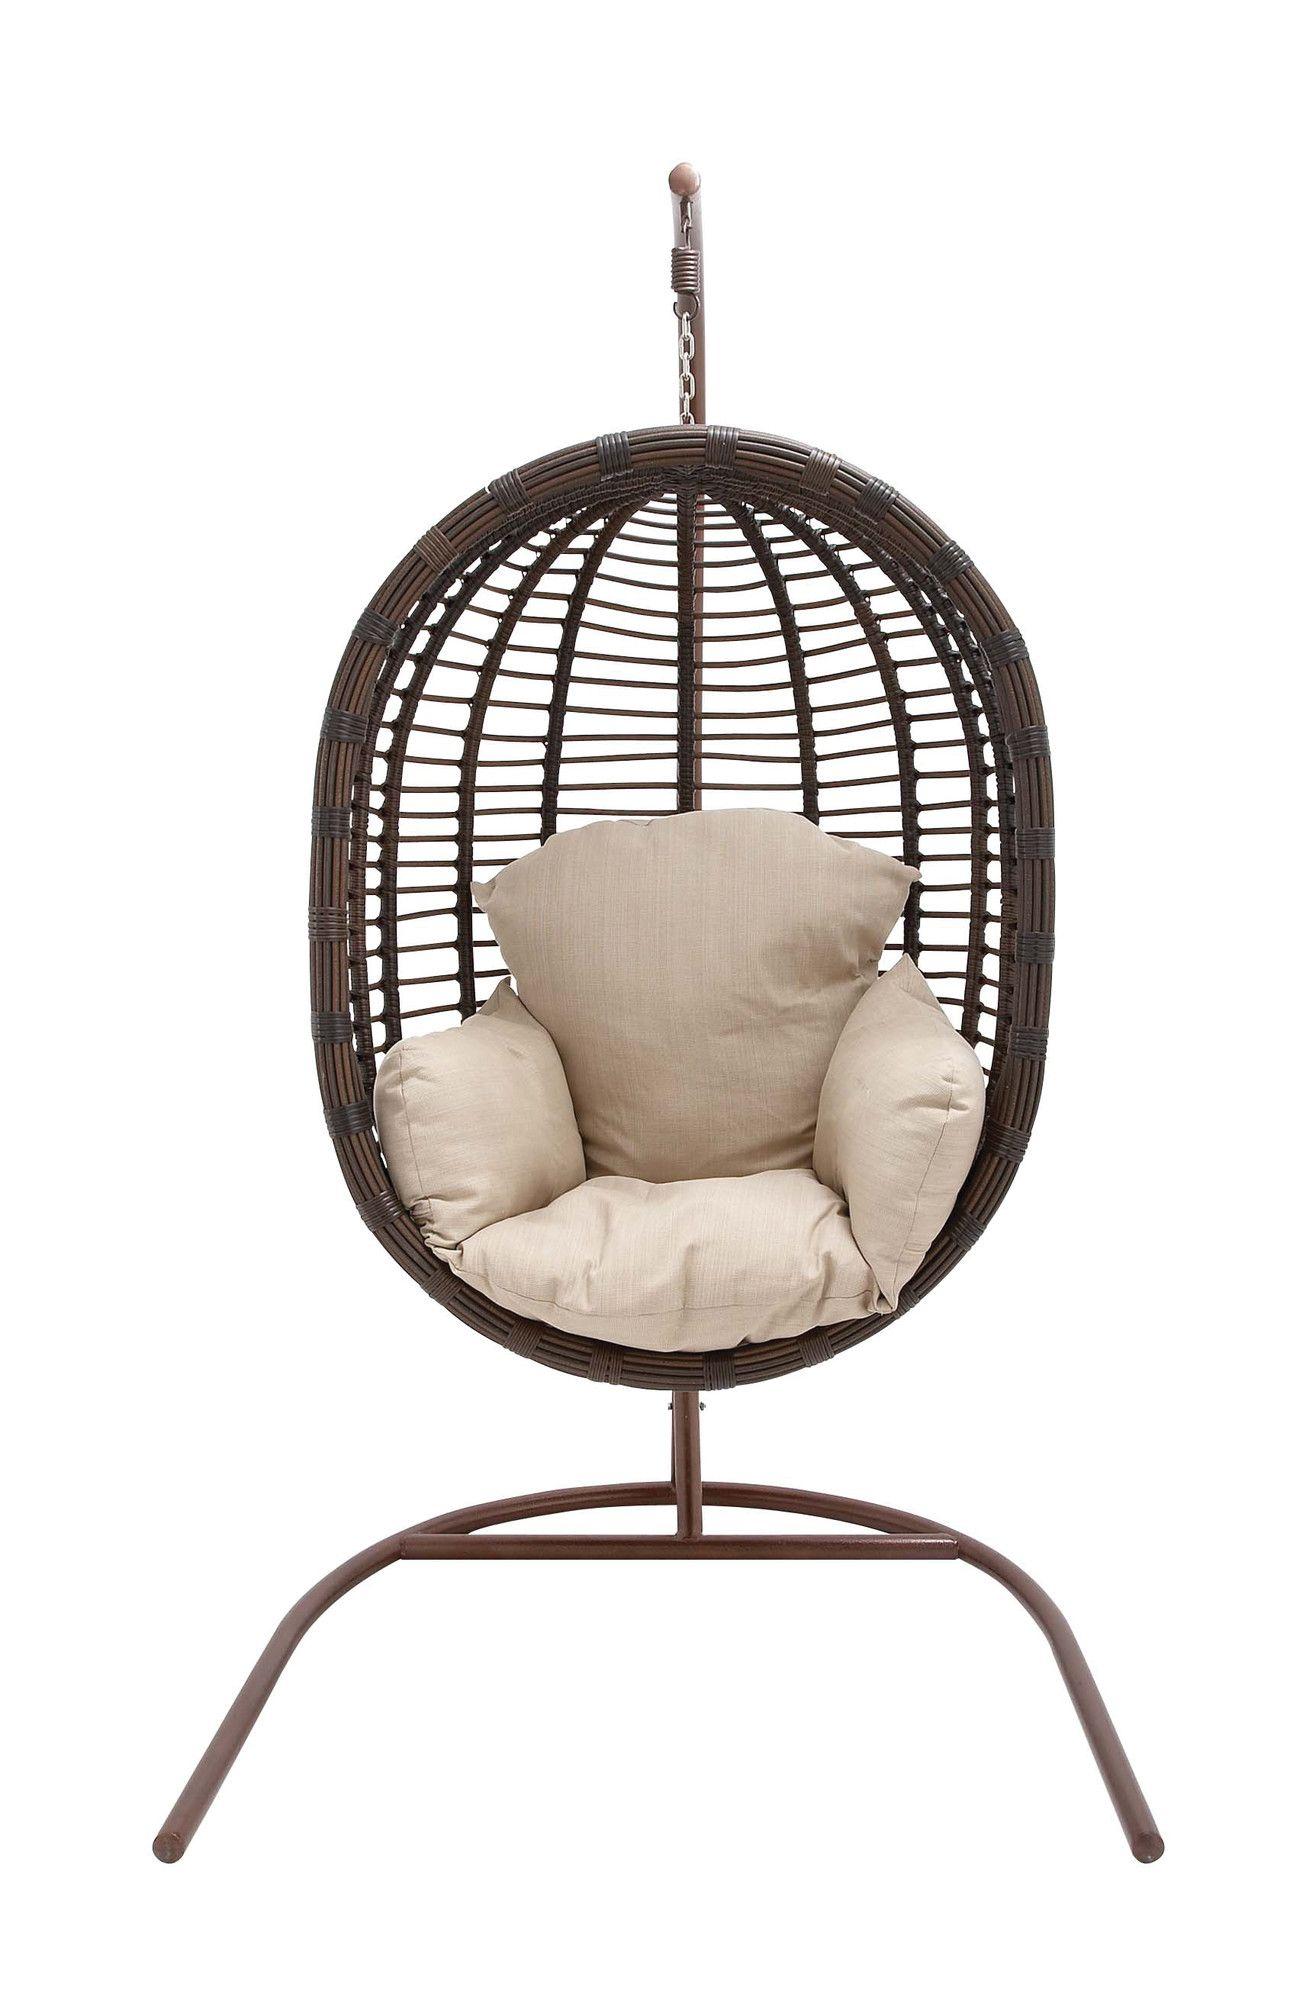 Mathilde Rattan Hanging Chair Swinging chair, Hanging